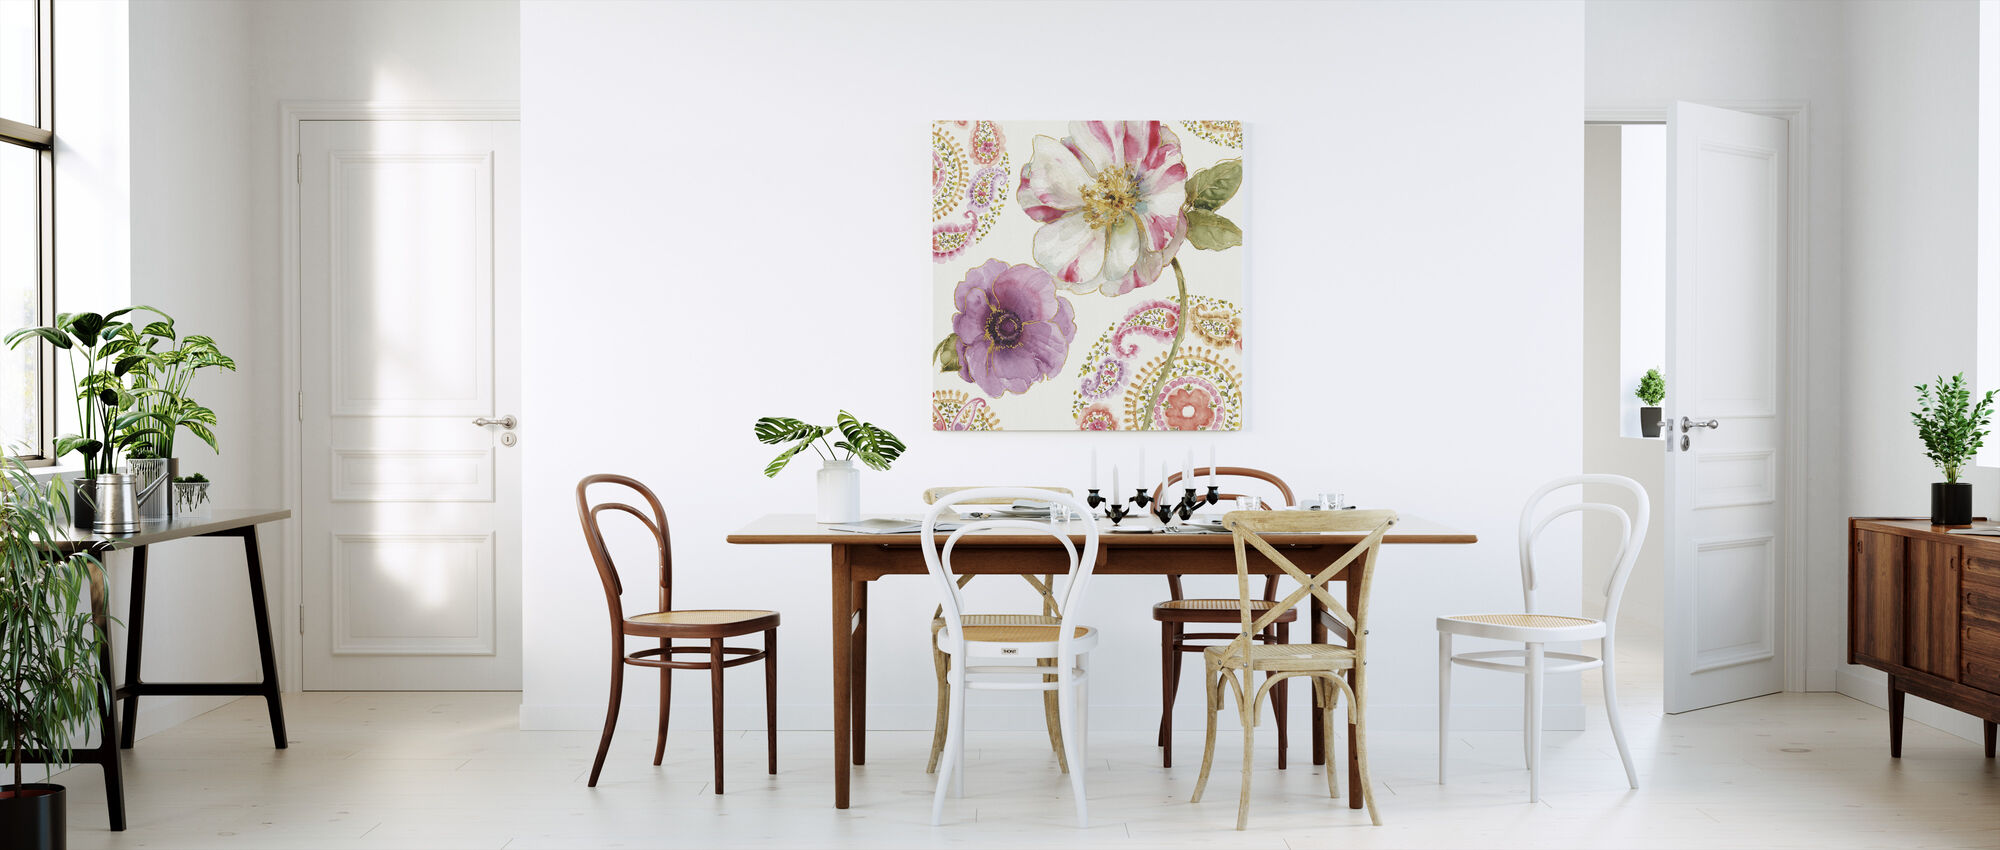 Regenboog Zaden Paisley 1 - Canvas print - Keuken